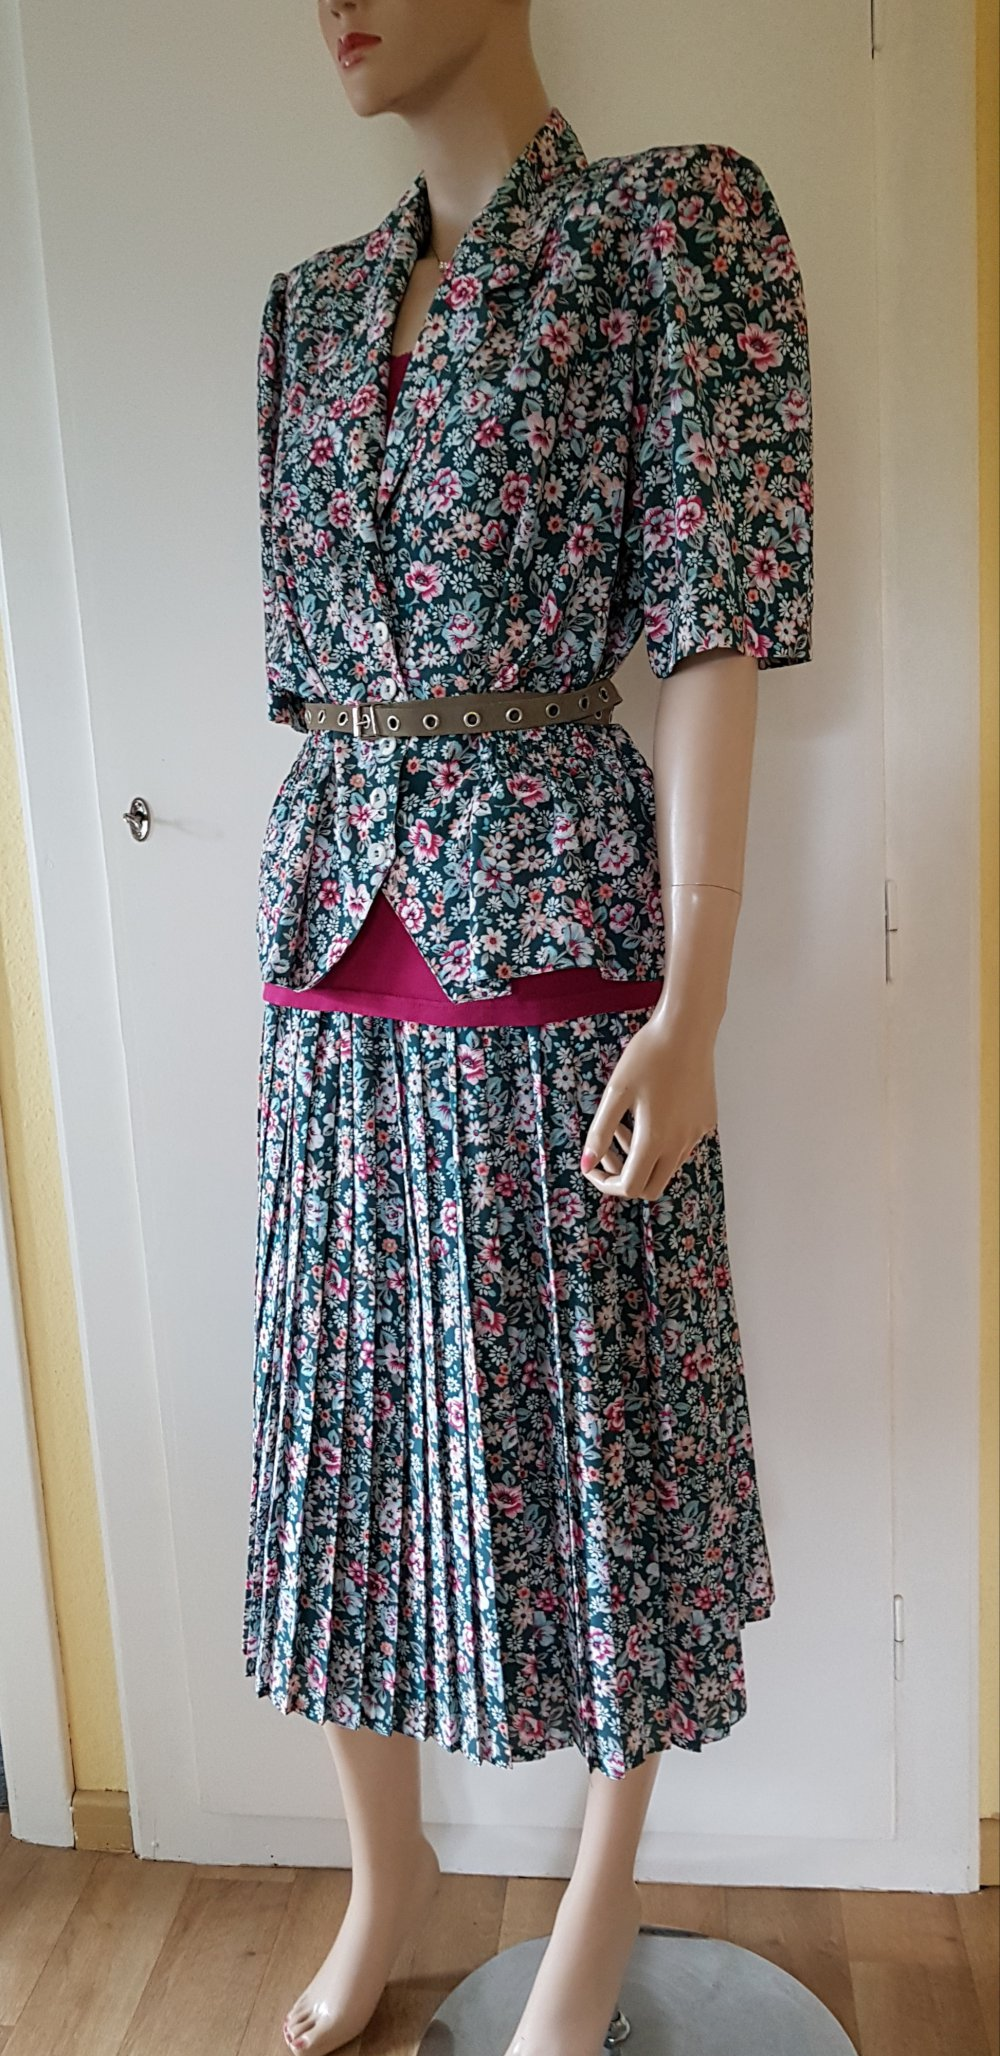 13 Teiler Rock Blazer Bluse Kleid Midirock Gr.131 (413) Walbusch Faltenrock  Kostüm Sommer